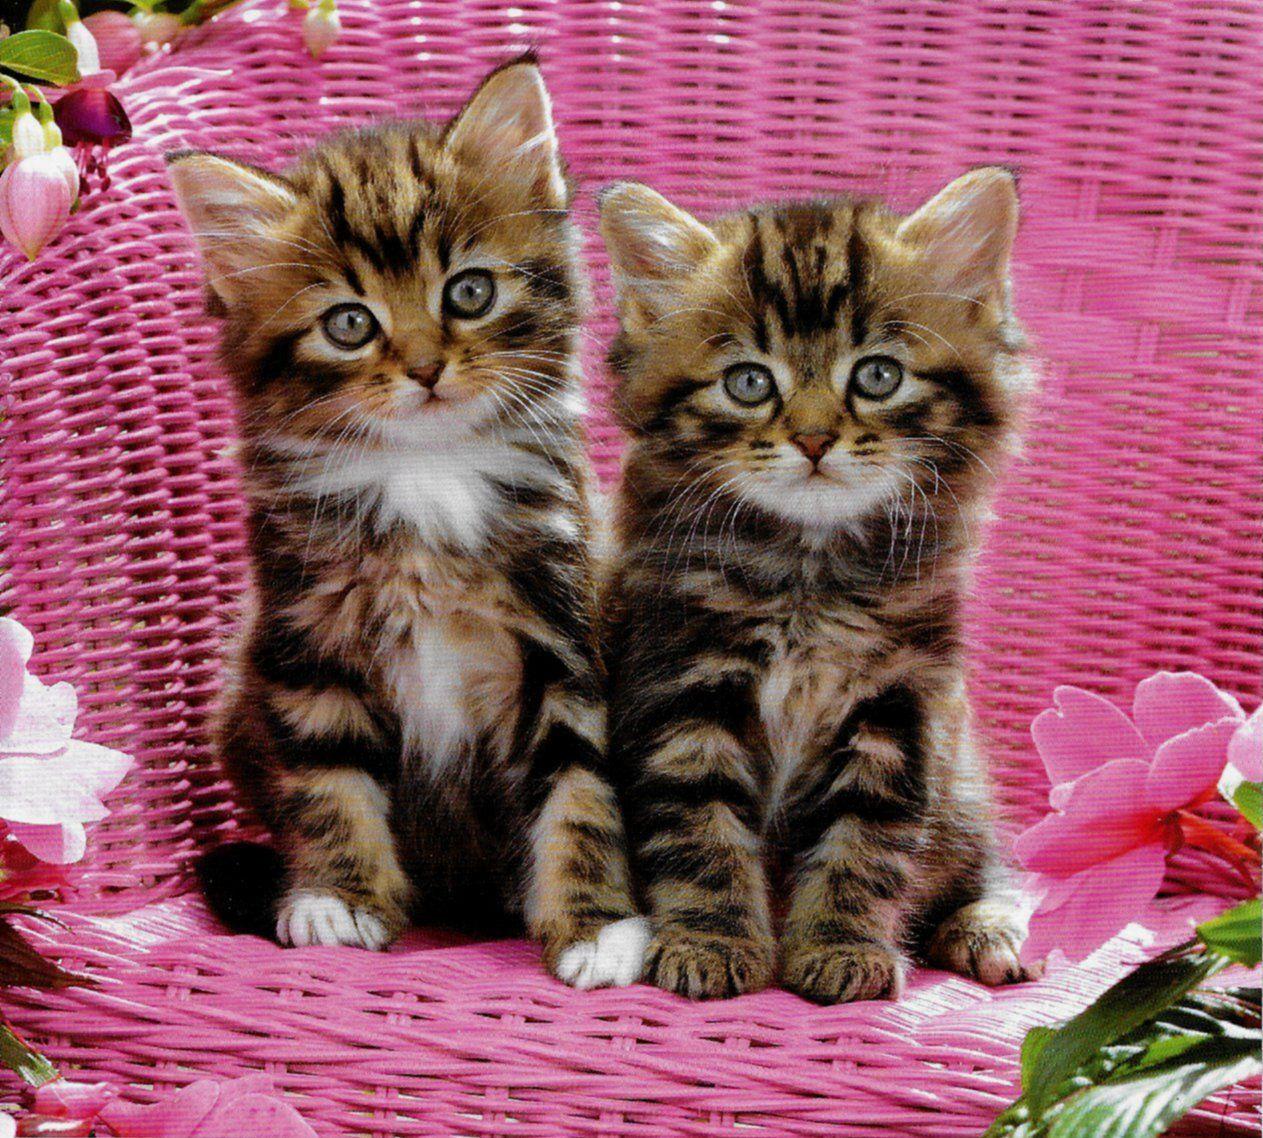 Cute pair of little tabby kittens sitting on a garden